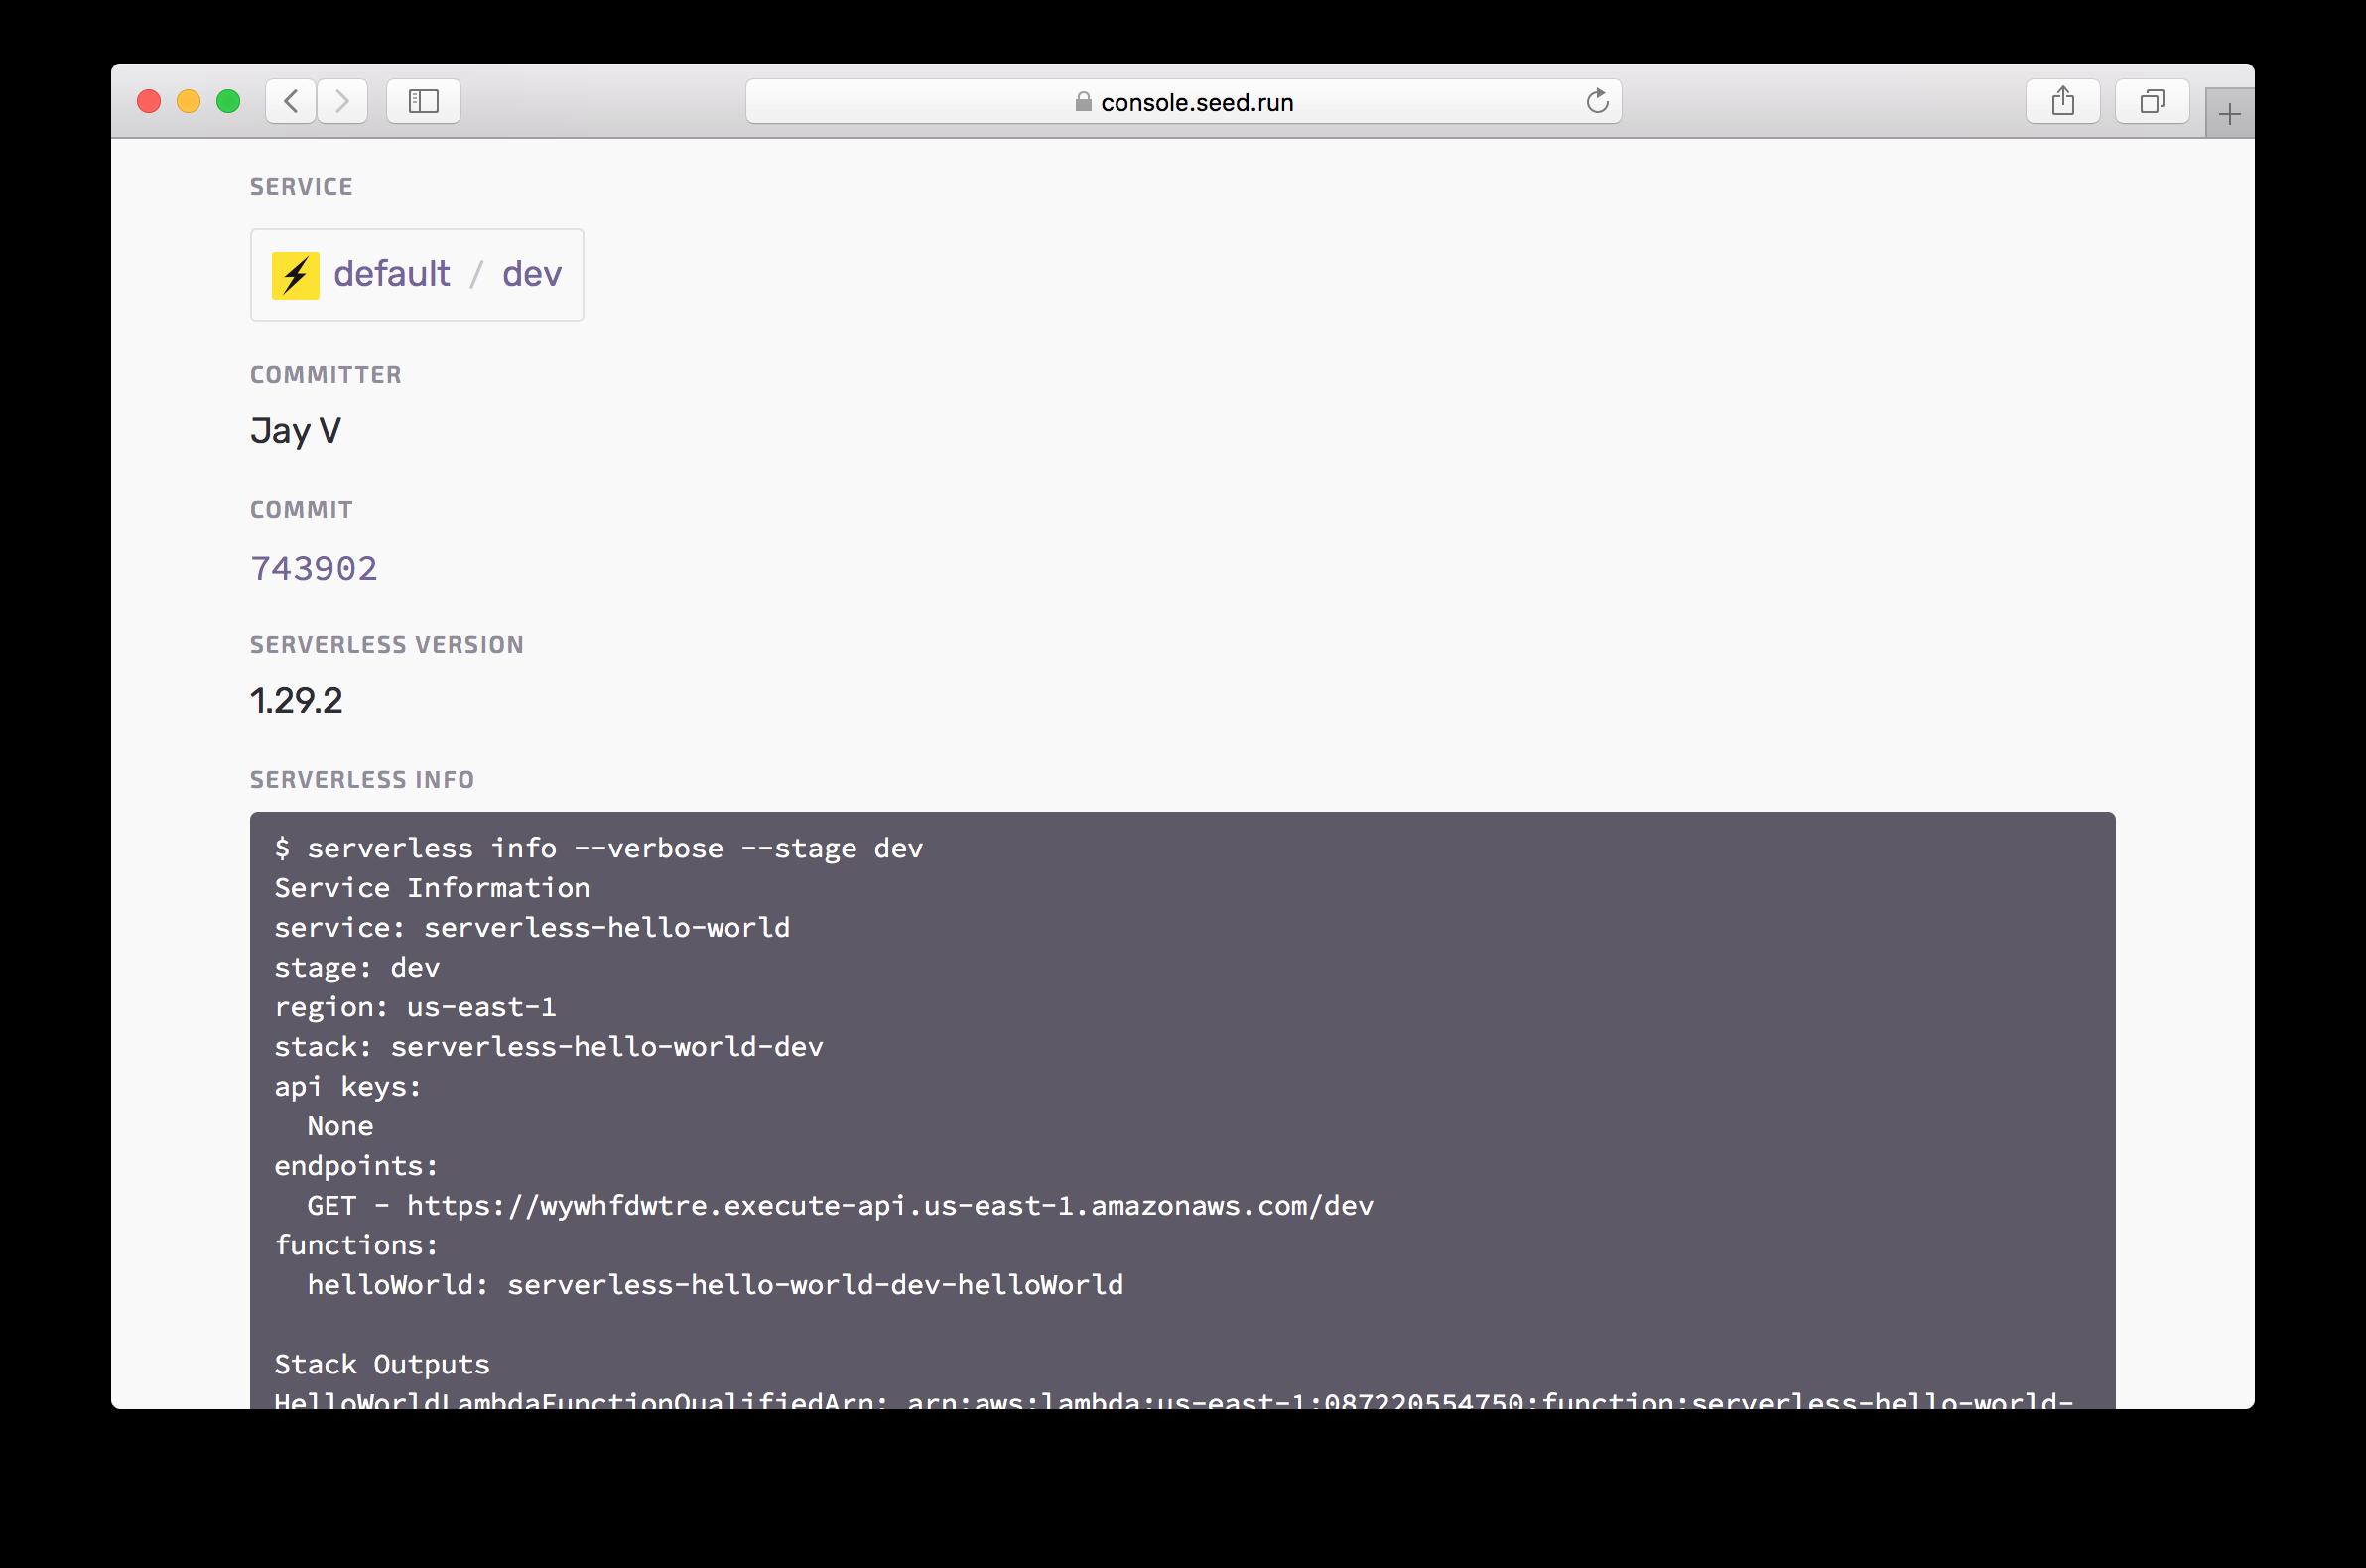 Serverless build details in Seed